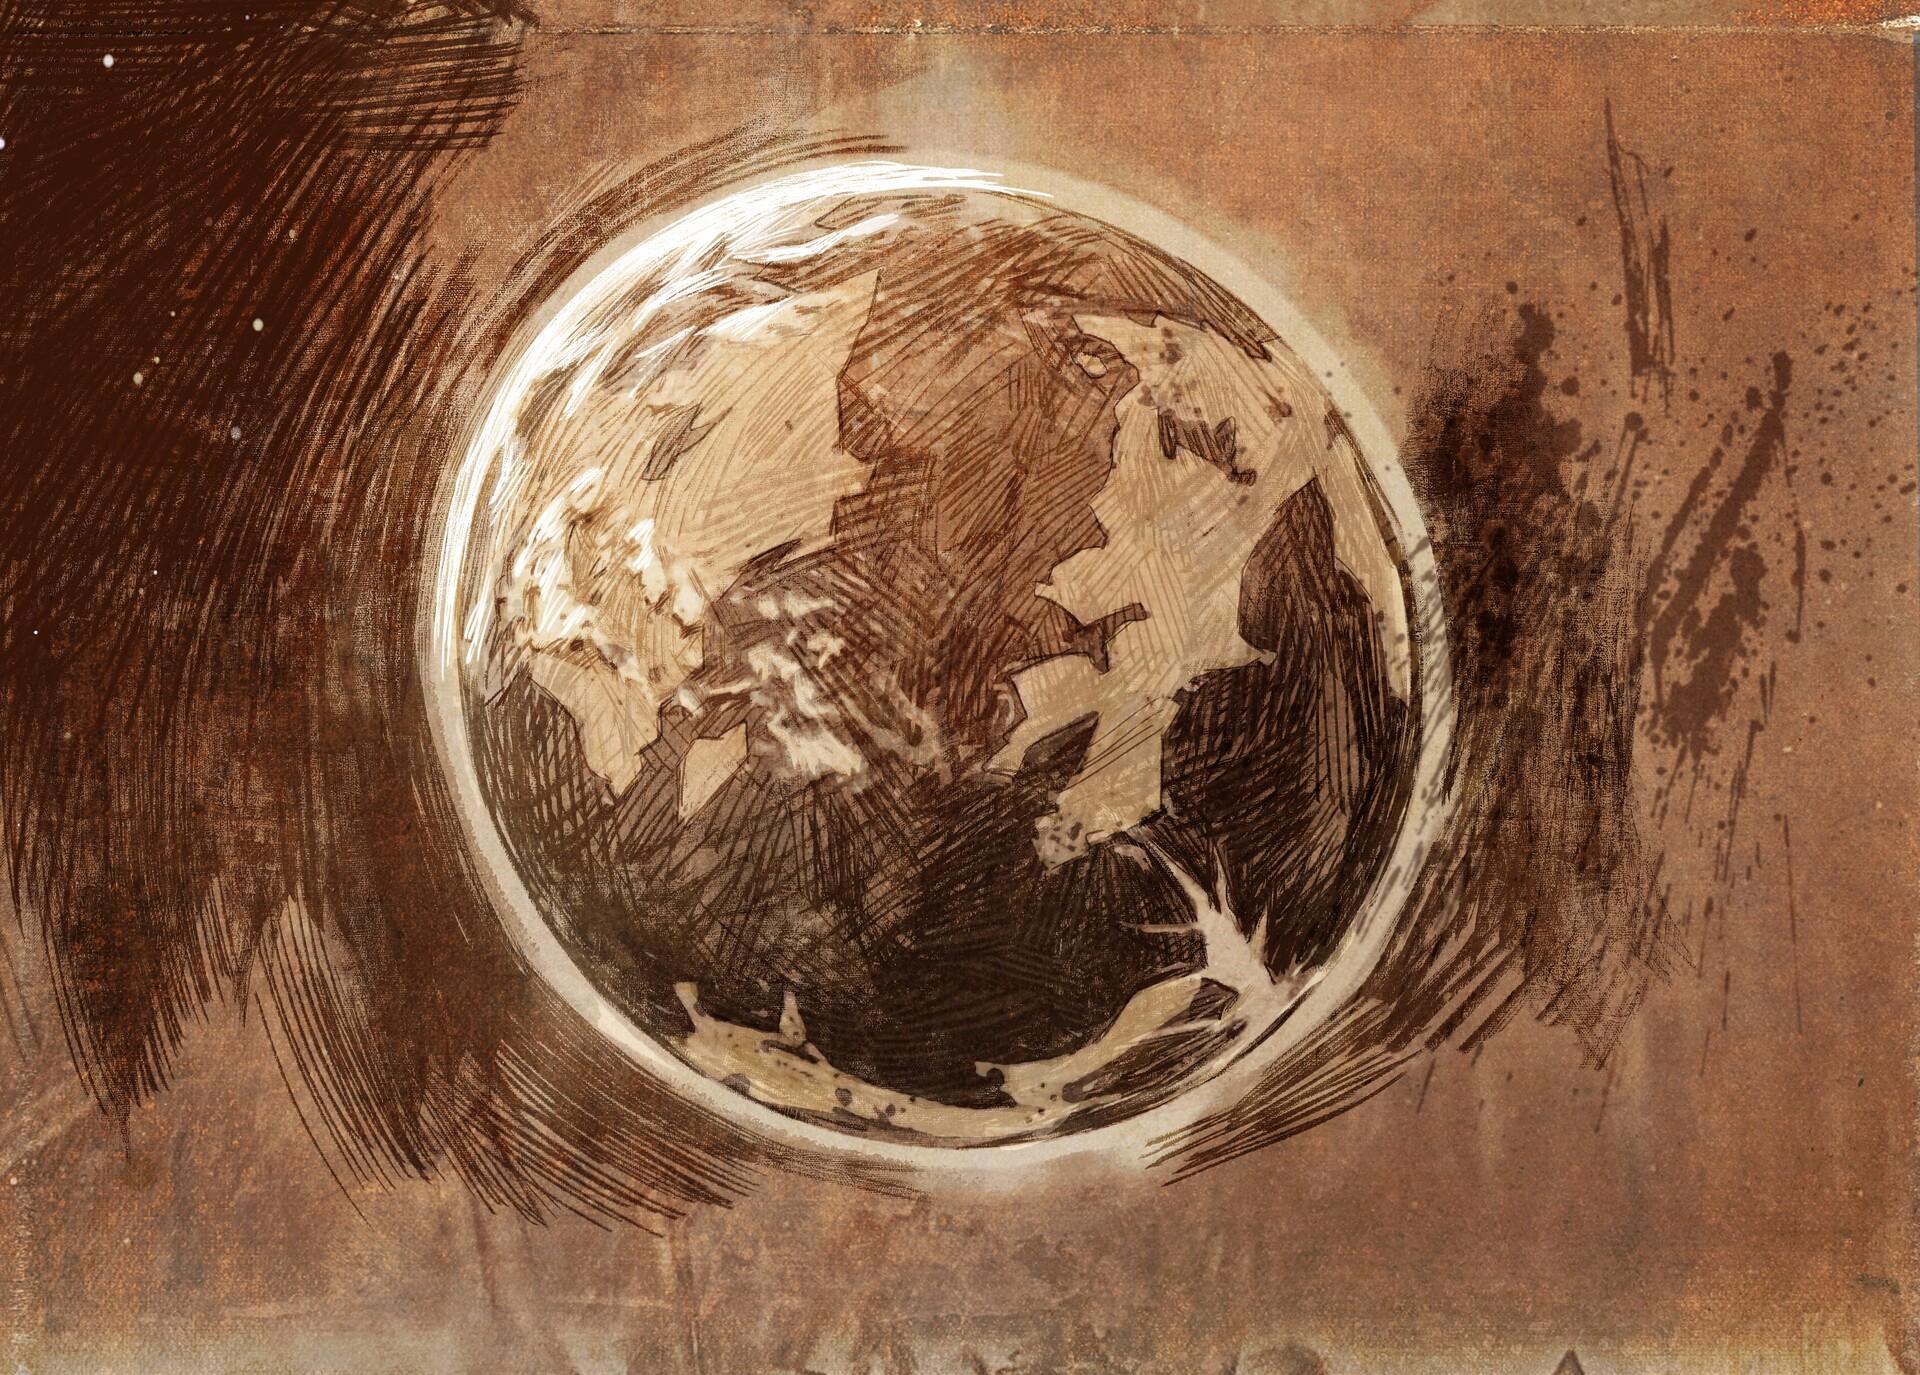 Jens claessens pandora planet2